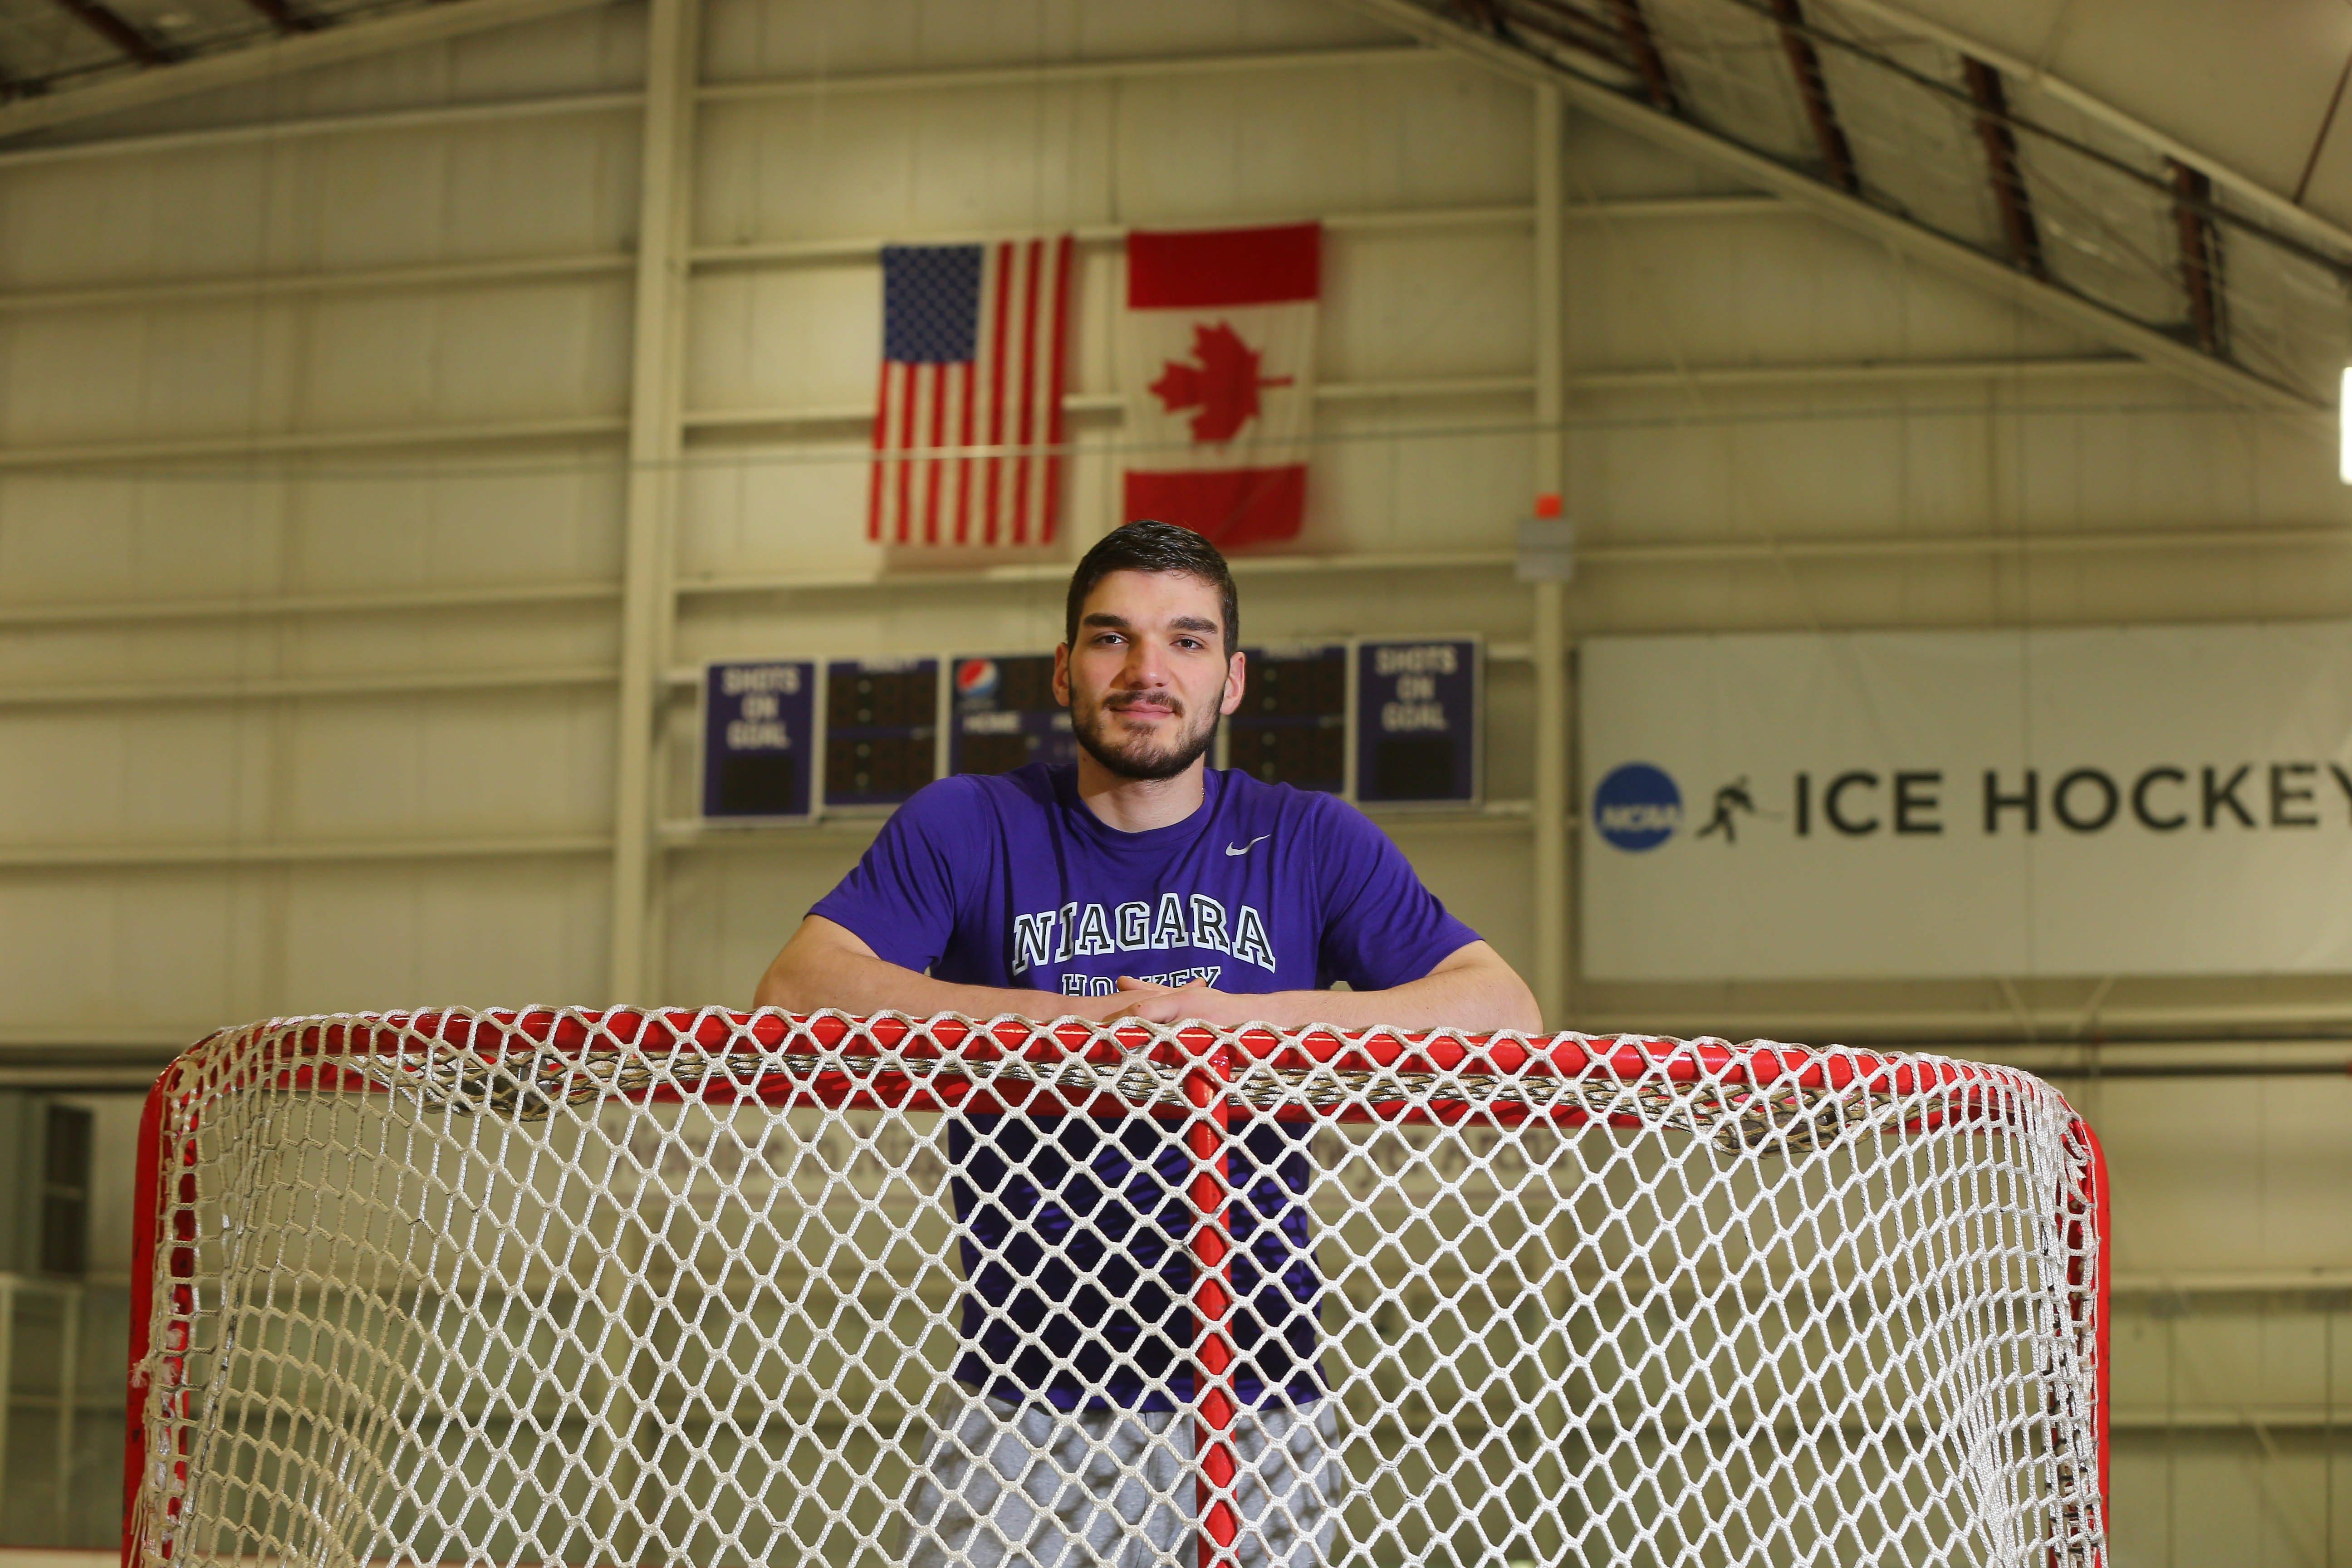 Russian hockey player Stan Dzakhov took a long winding road to play for Niagara.